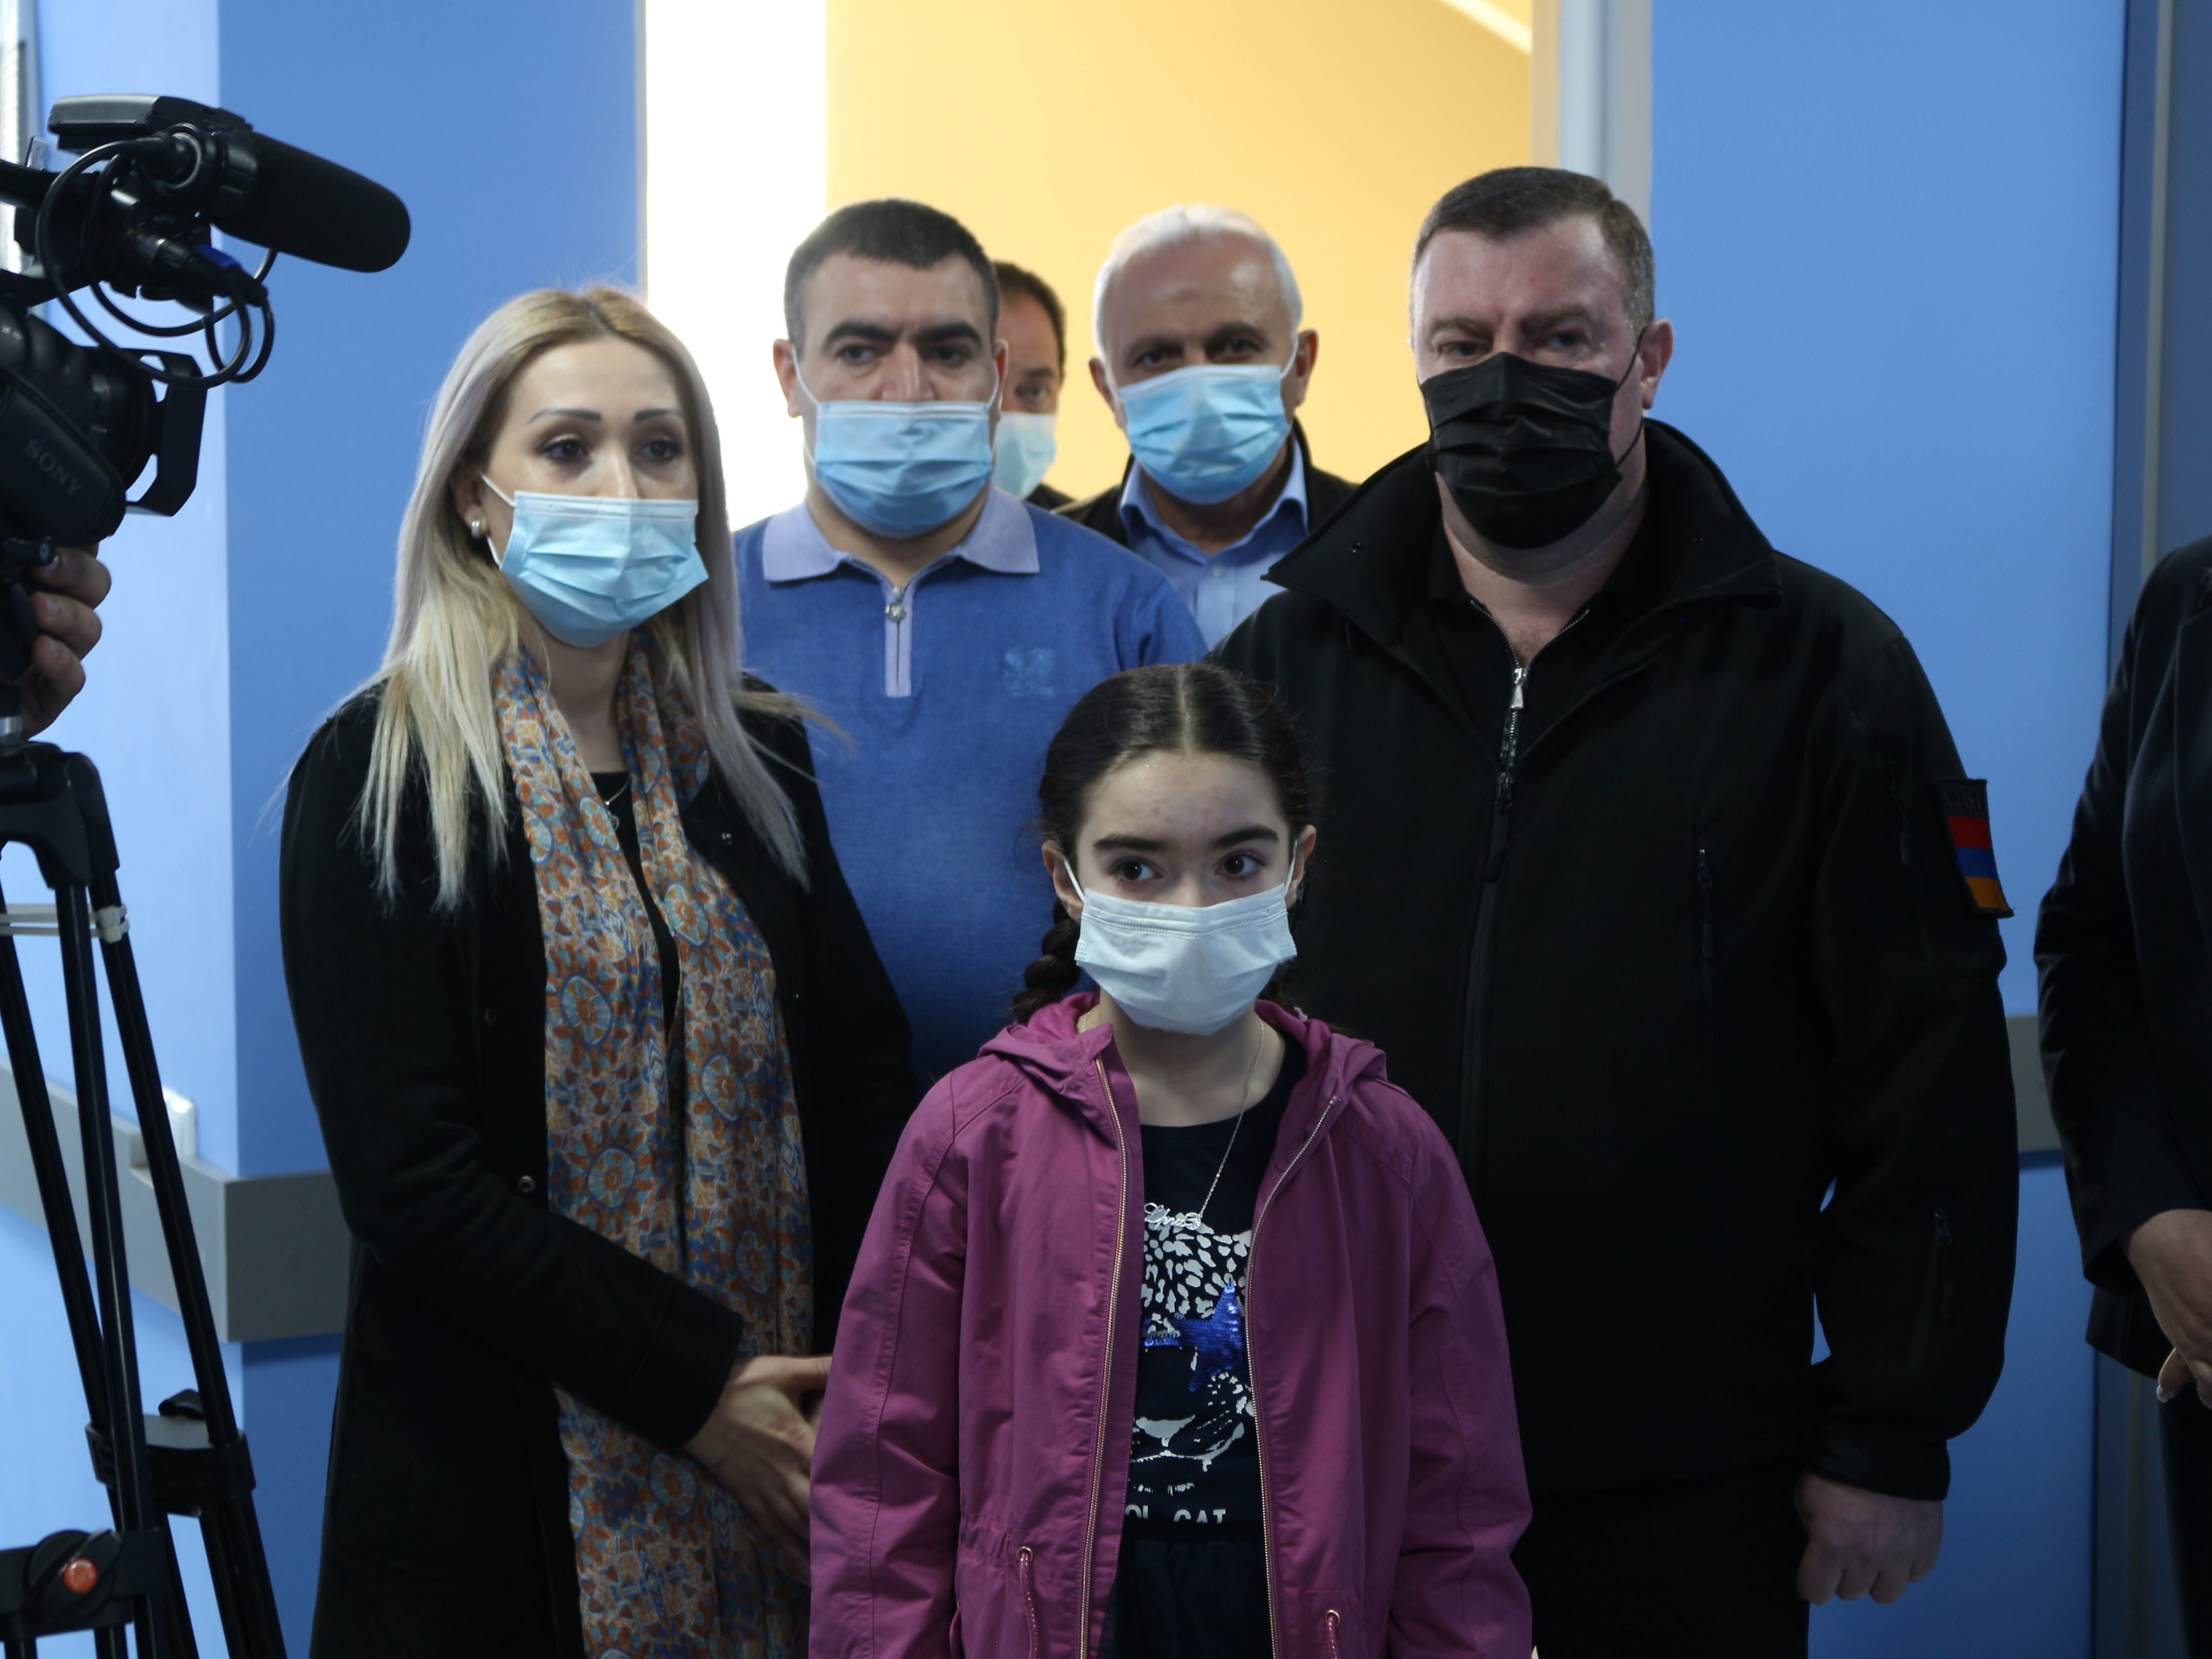 Photo of Միկրովիրաբուժության բաժանմունքն այսուհետ կրելու է հերոս Ալբերտ Հովհաննիսյանի անունը